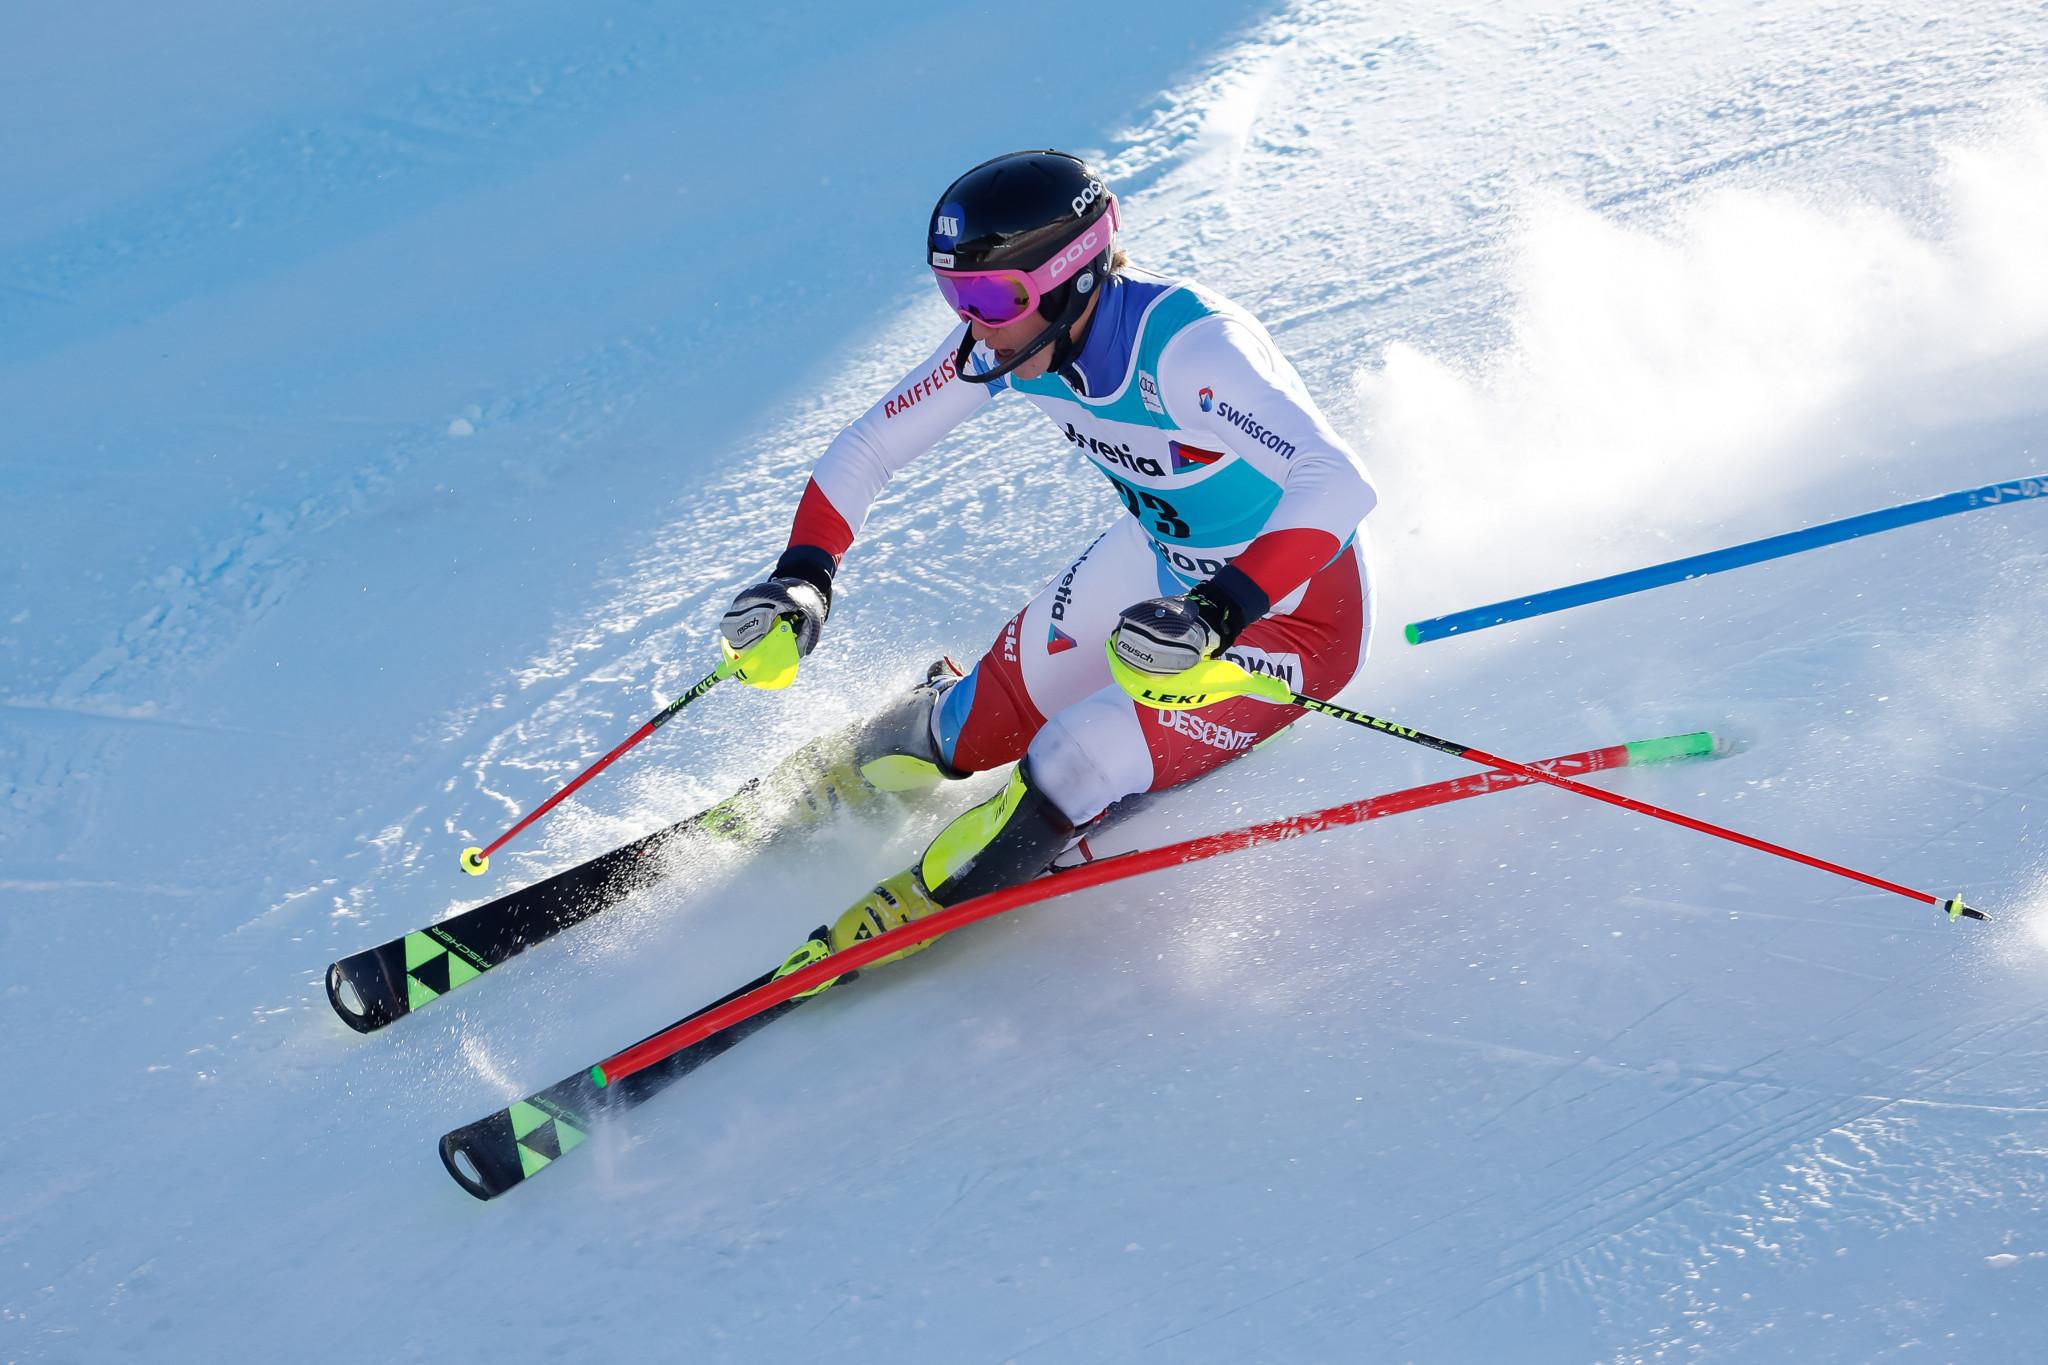 Swiss skier Nef wins International Matteo Baumgarten Award